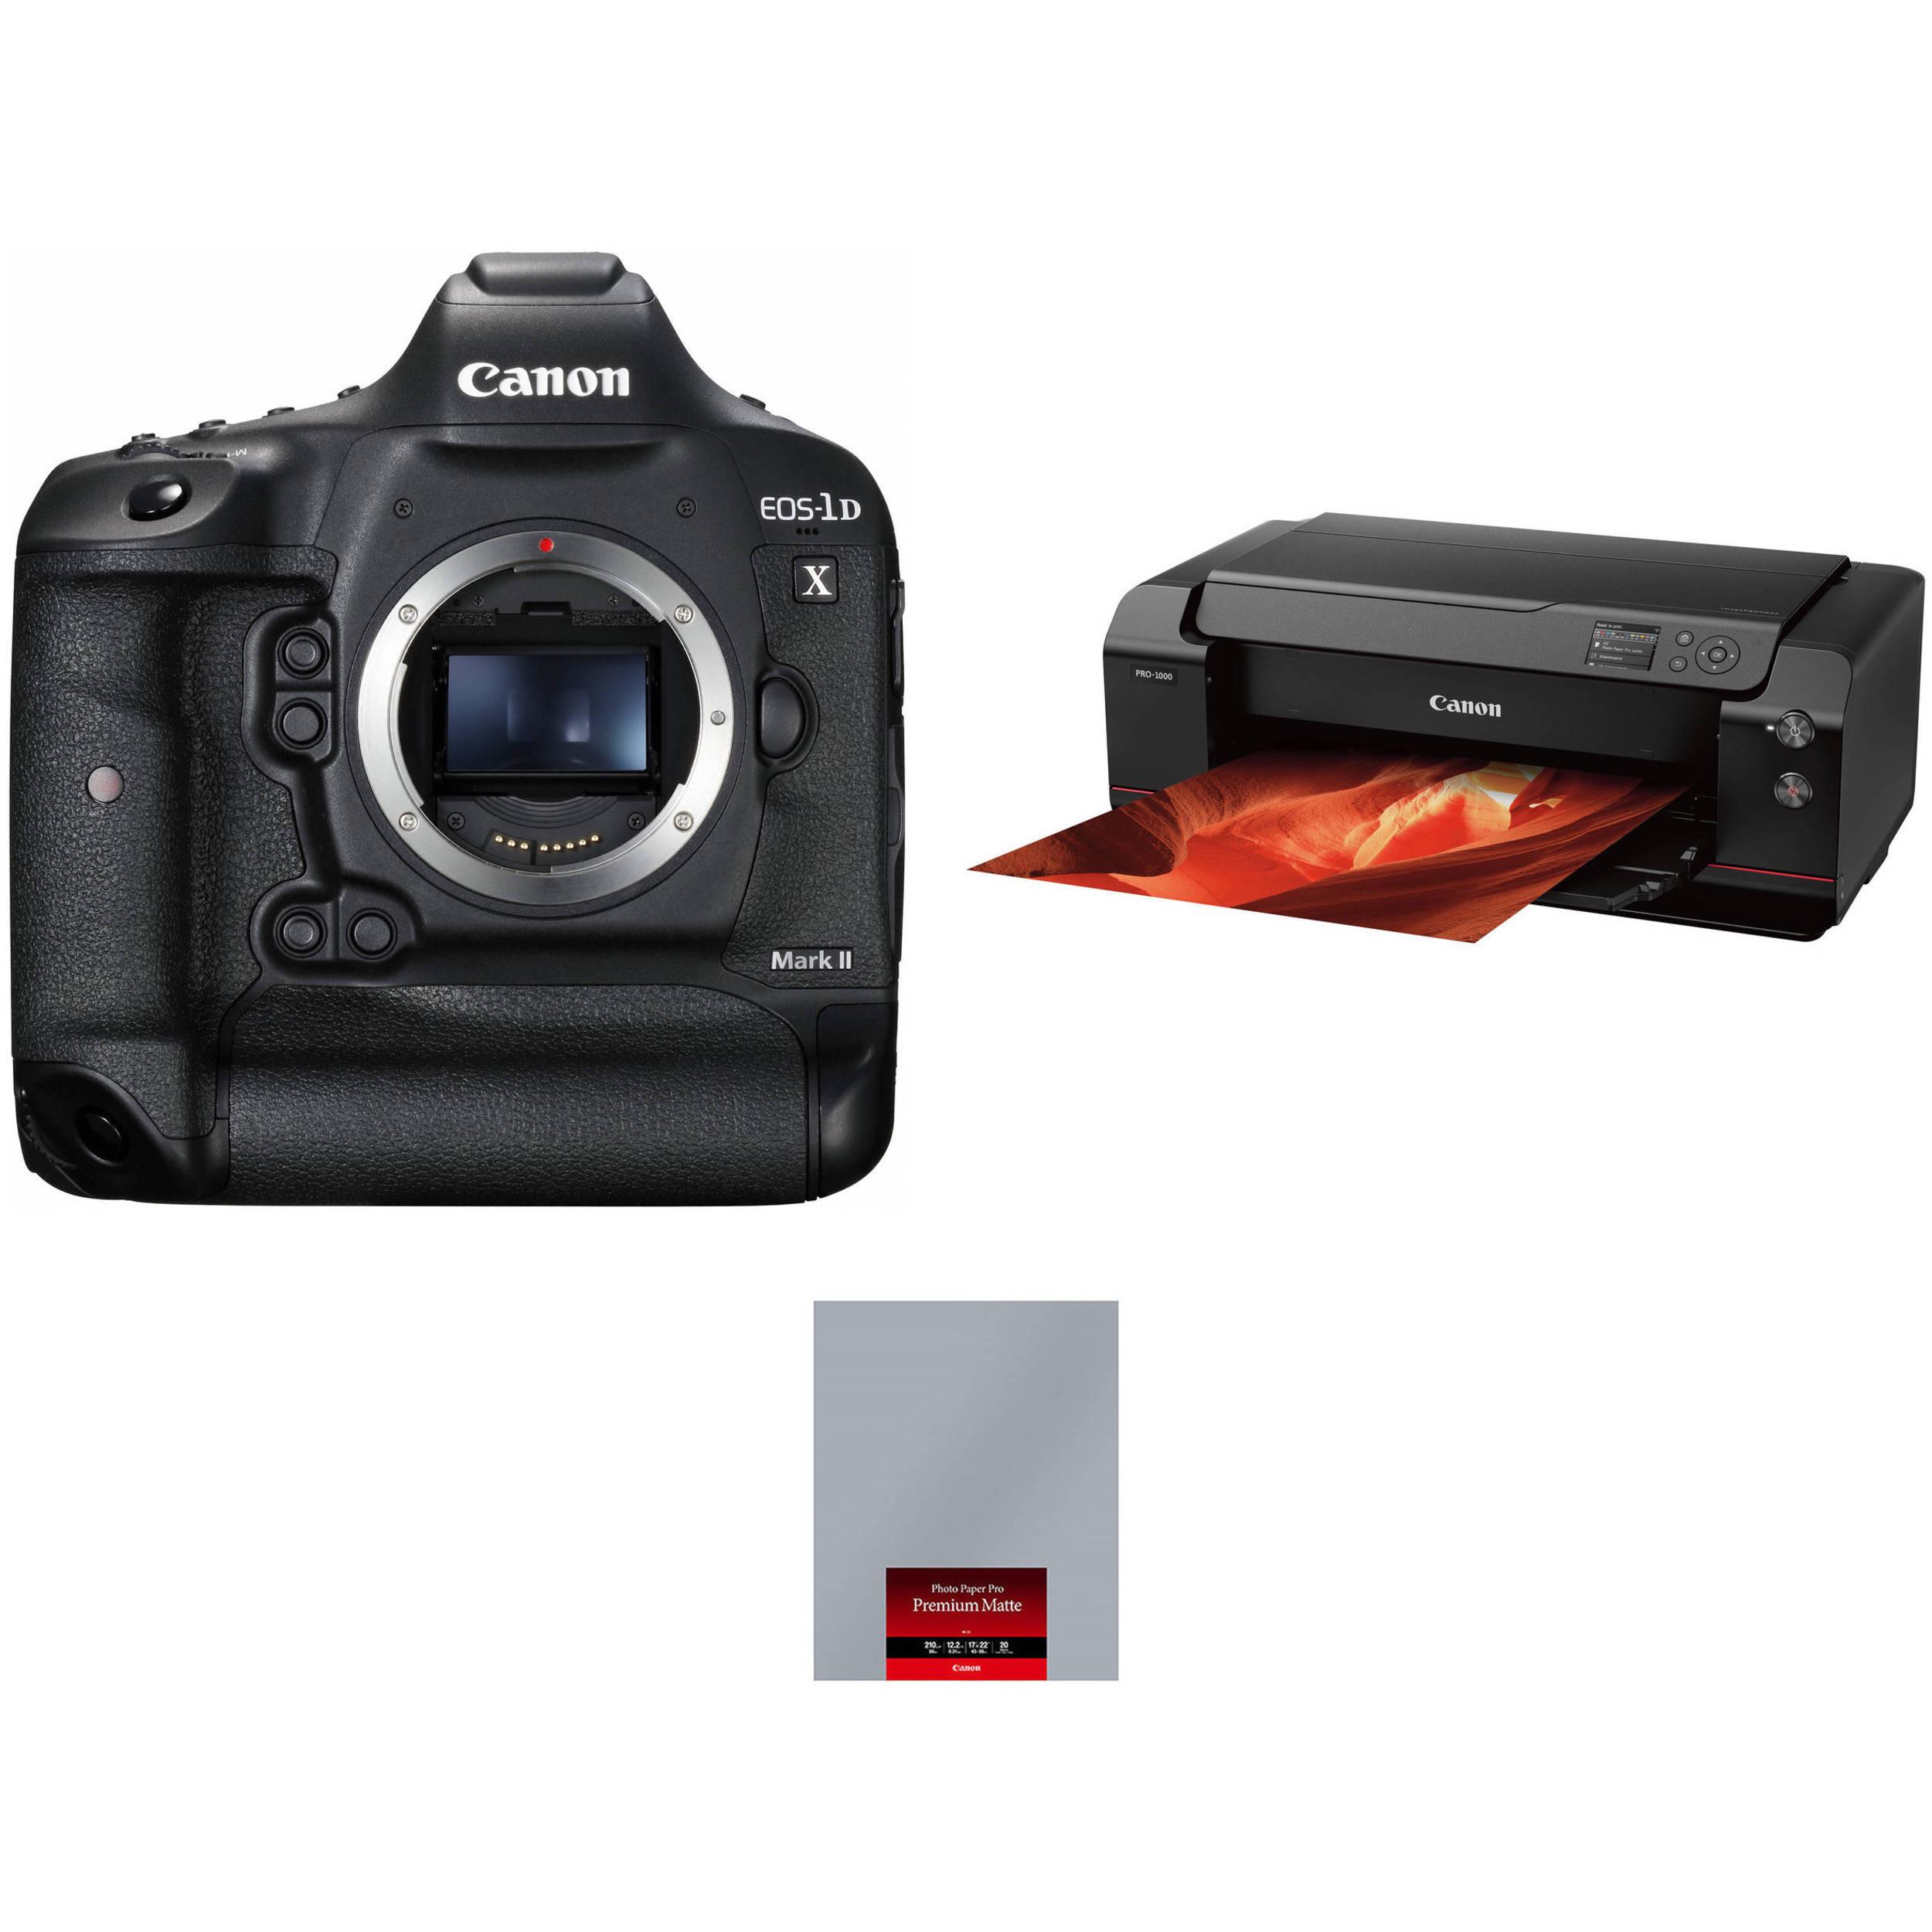 Canon Eos 1d X Mark Ii Camera Body With Inkjet Printer Kit B Amp H